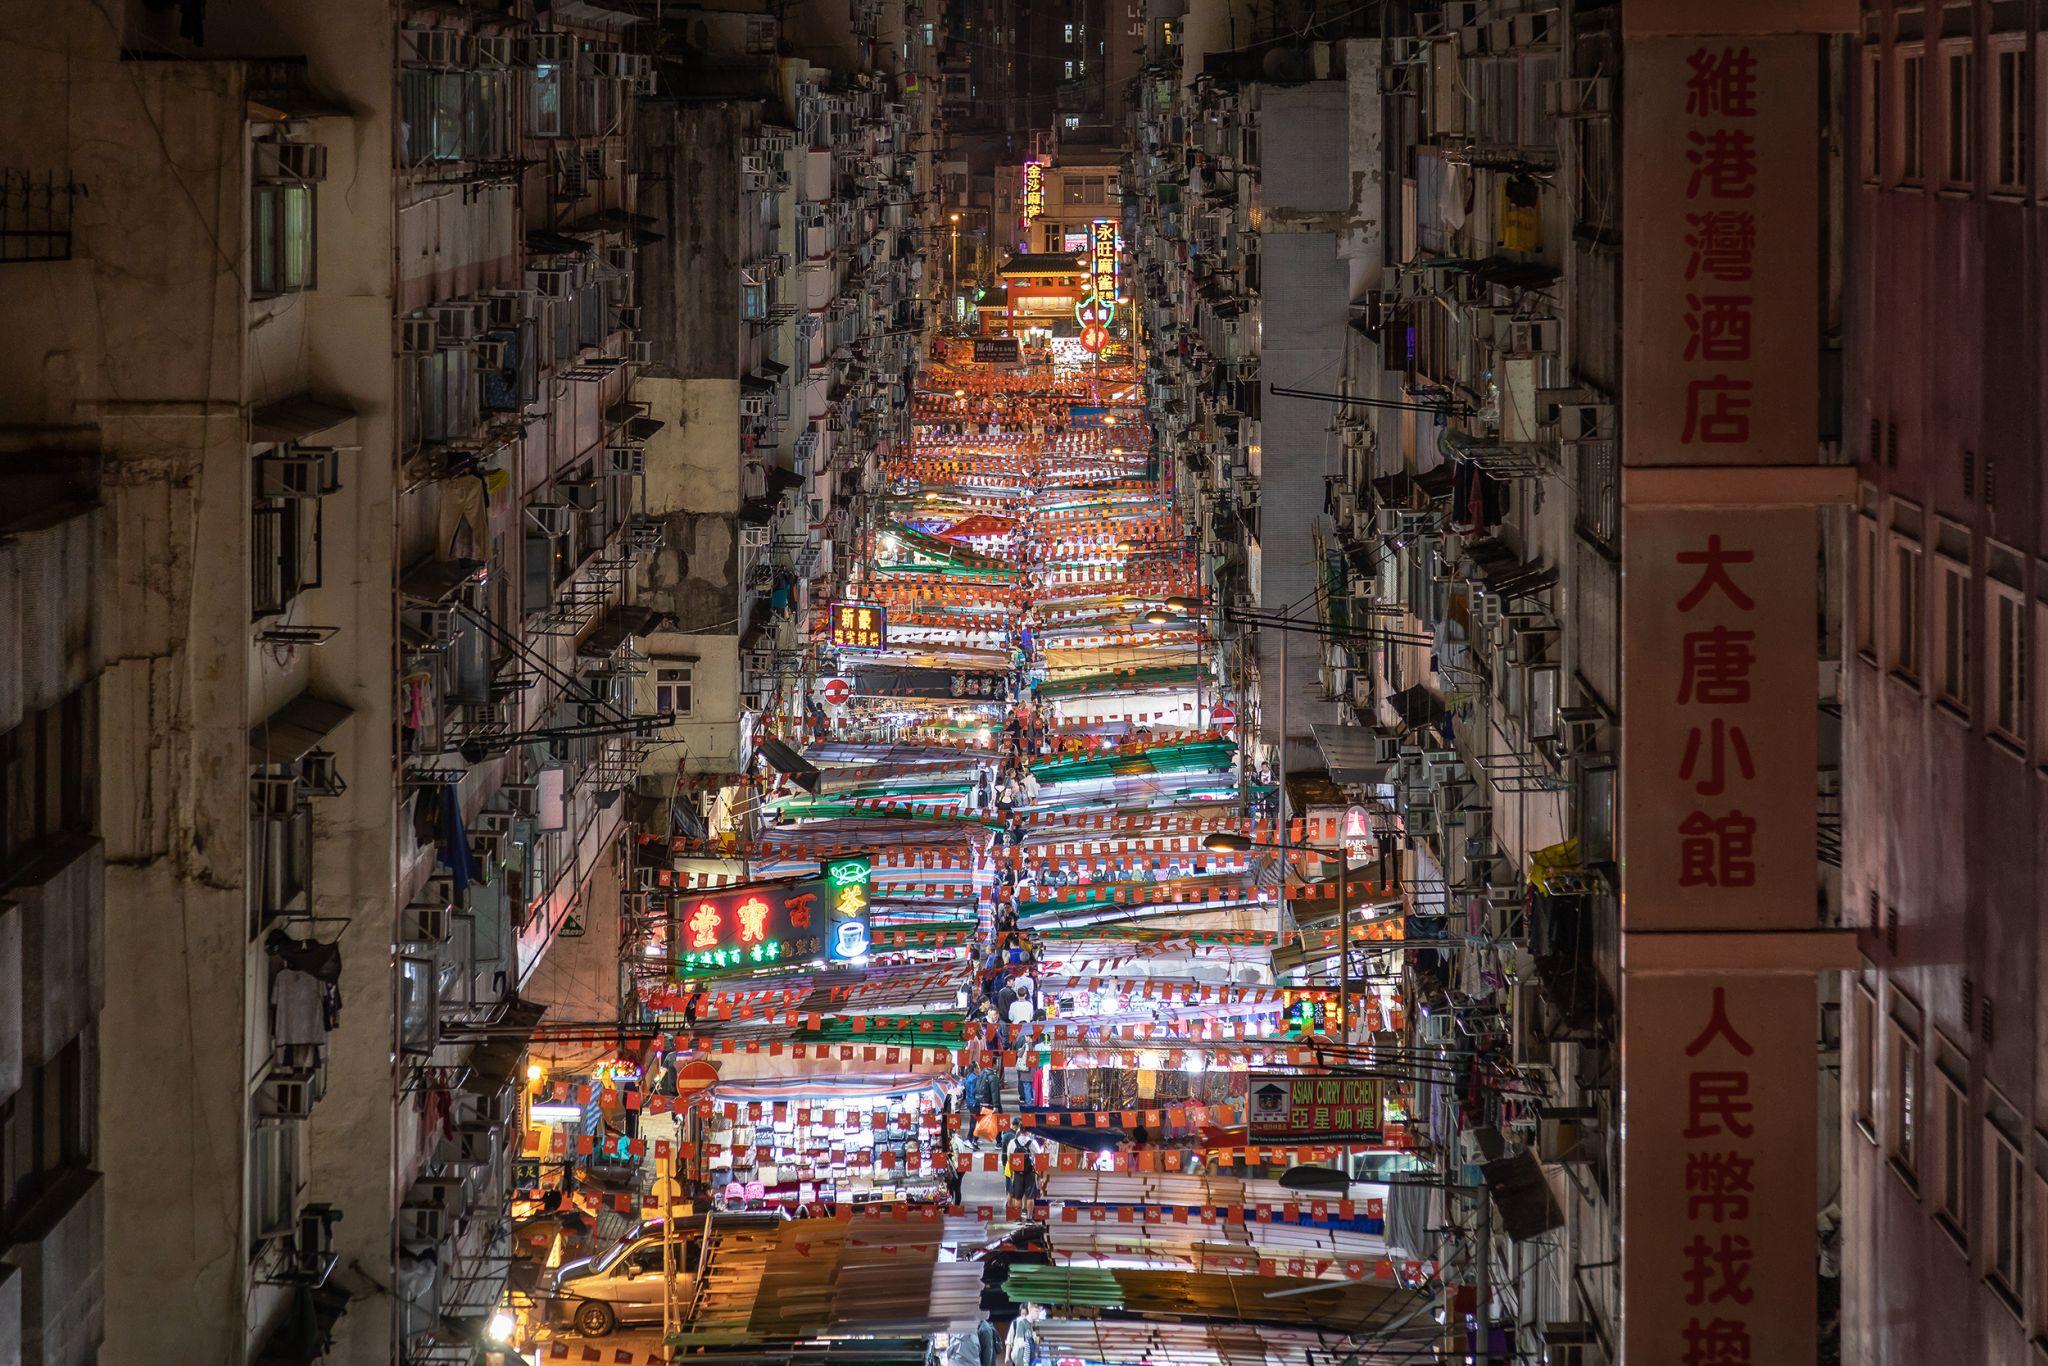 Temple Street Night Market [Aerial view], Hong Kong